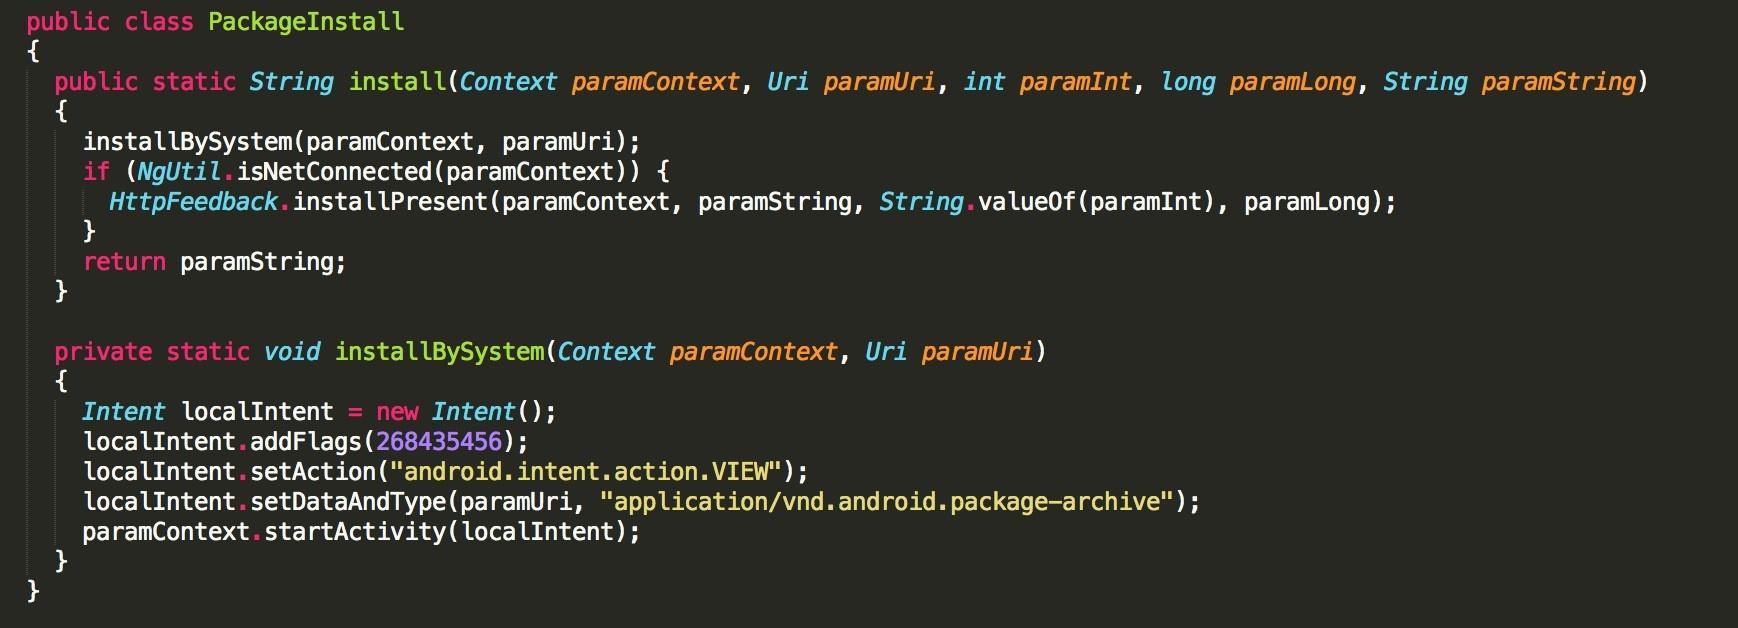 PackageInstall.install.jpg